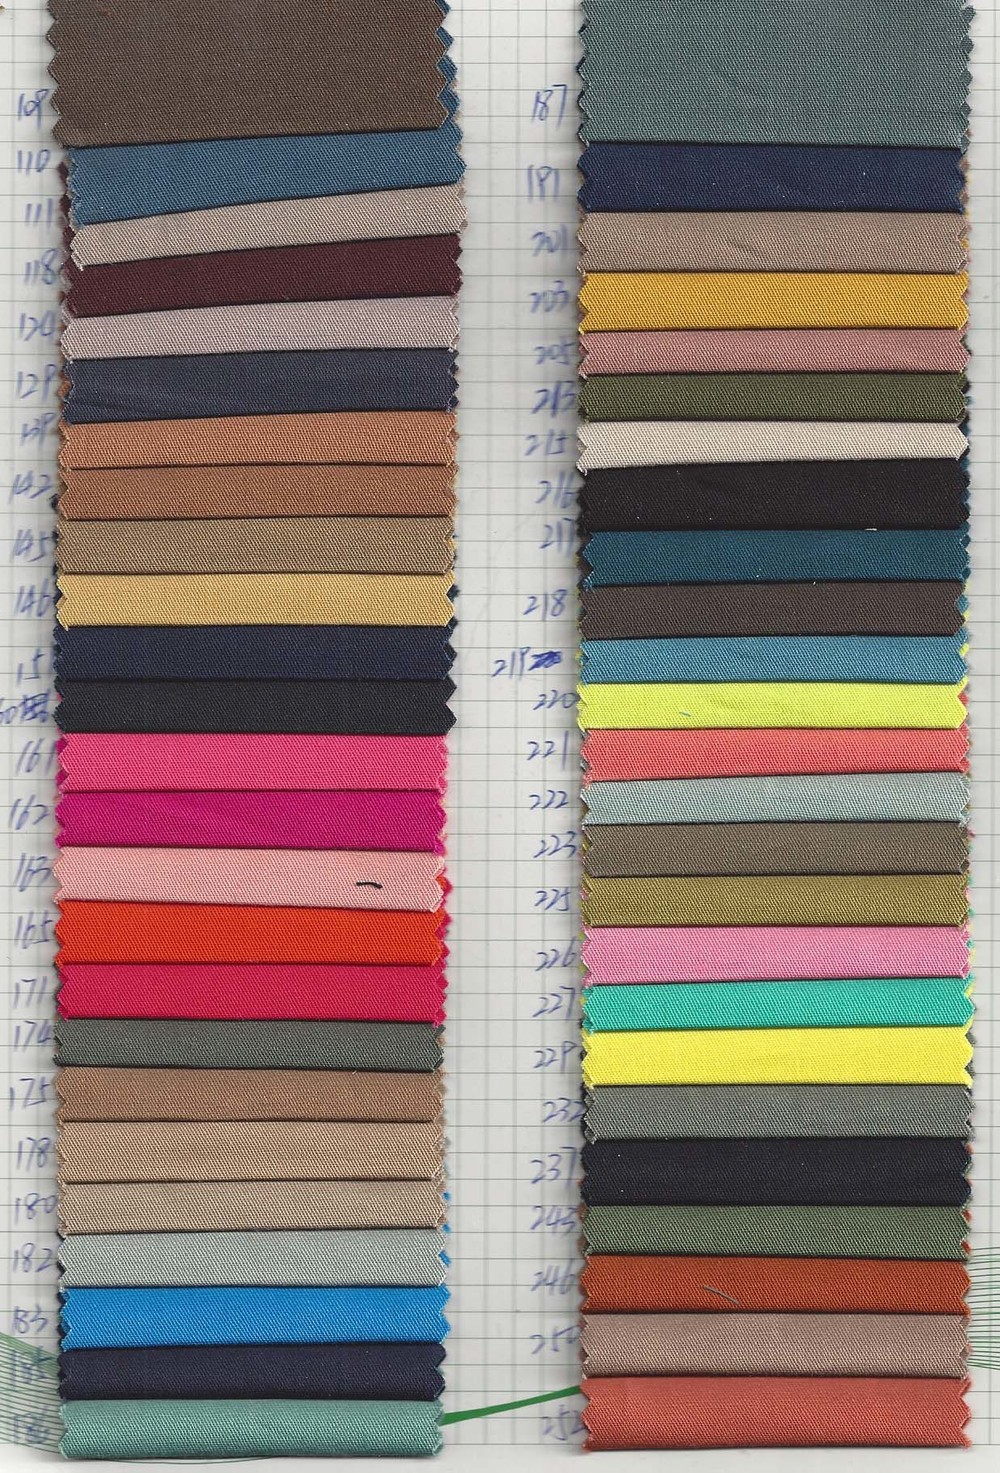 Textile Da Yuan C1336-2.jpg